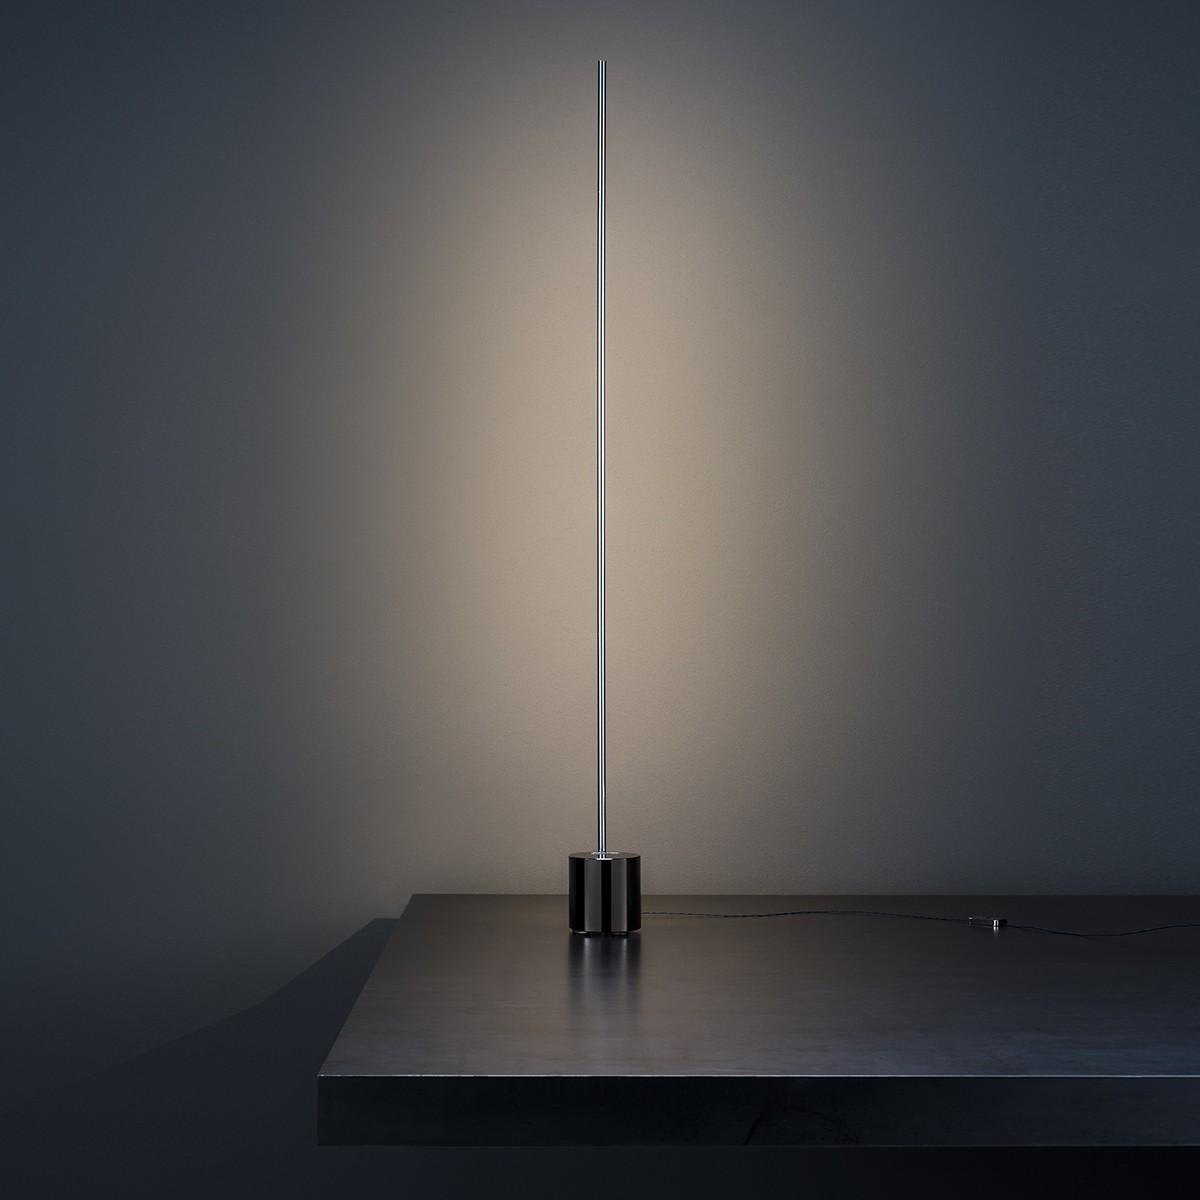 Catellani & Smith Light Stick T LED Tischleuchte, Nickel, Sockel: Metall brüniert